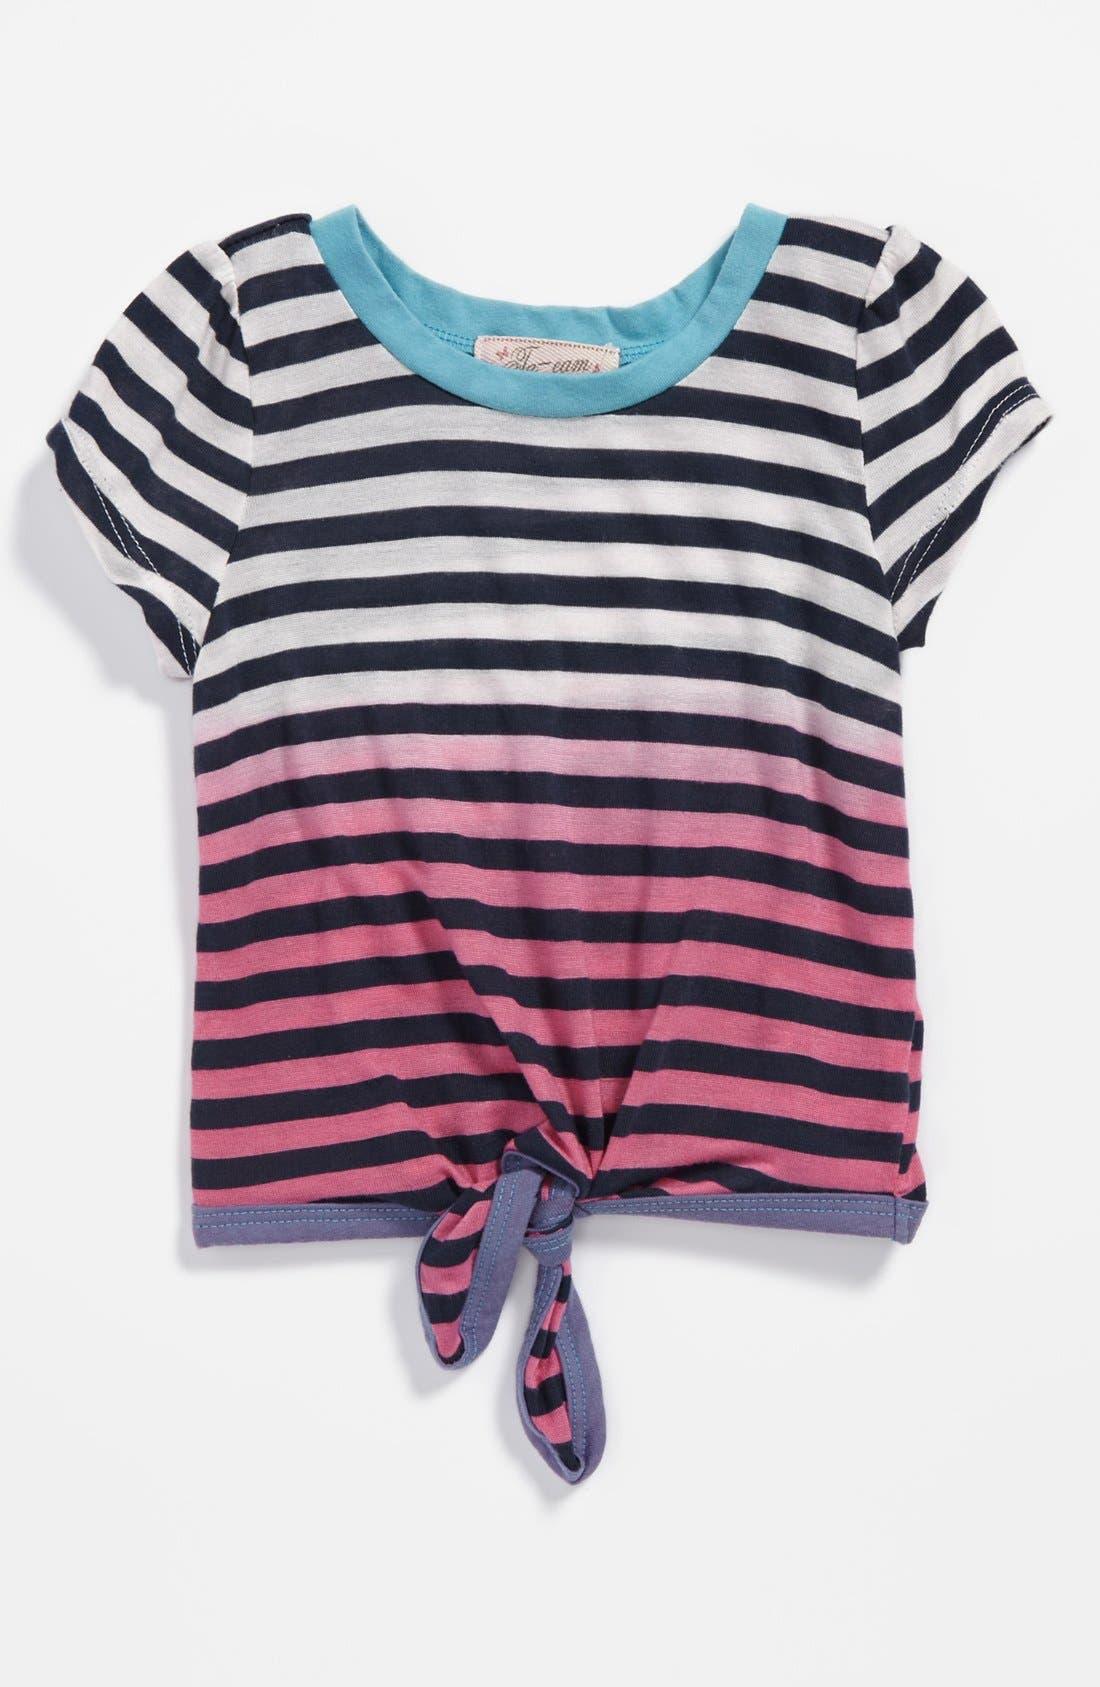 Main Image - TA-EAM Tie Front Tee (Toddler Girls)